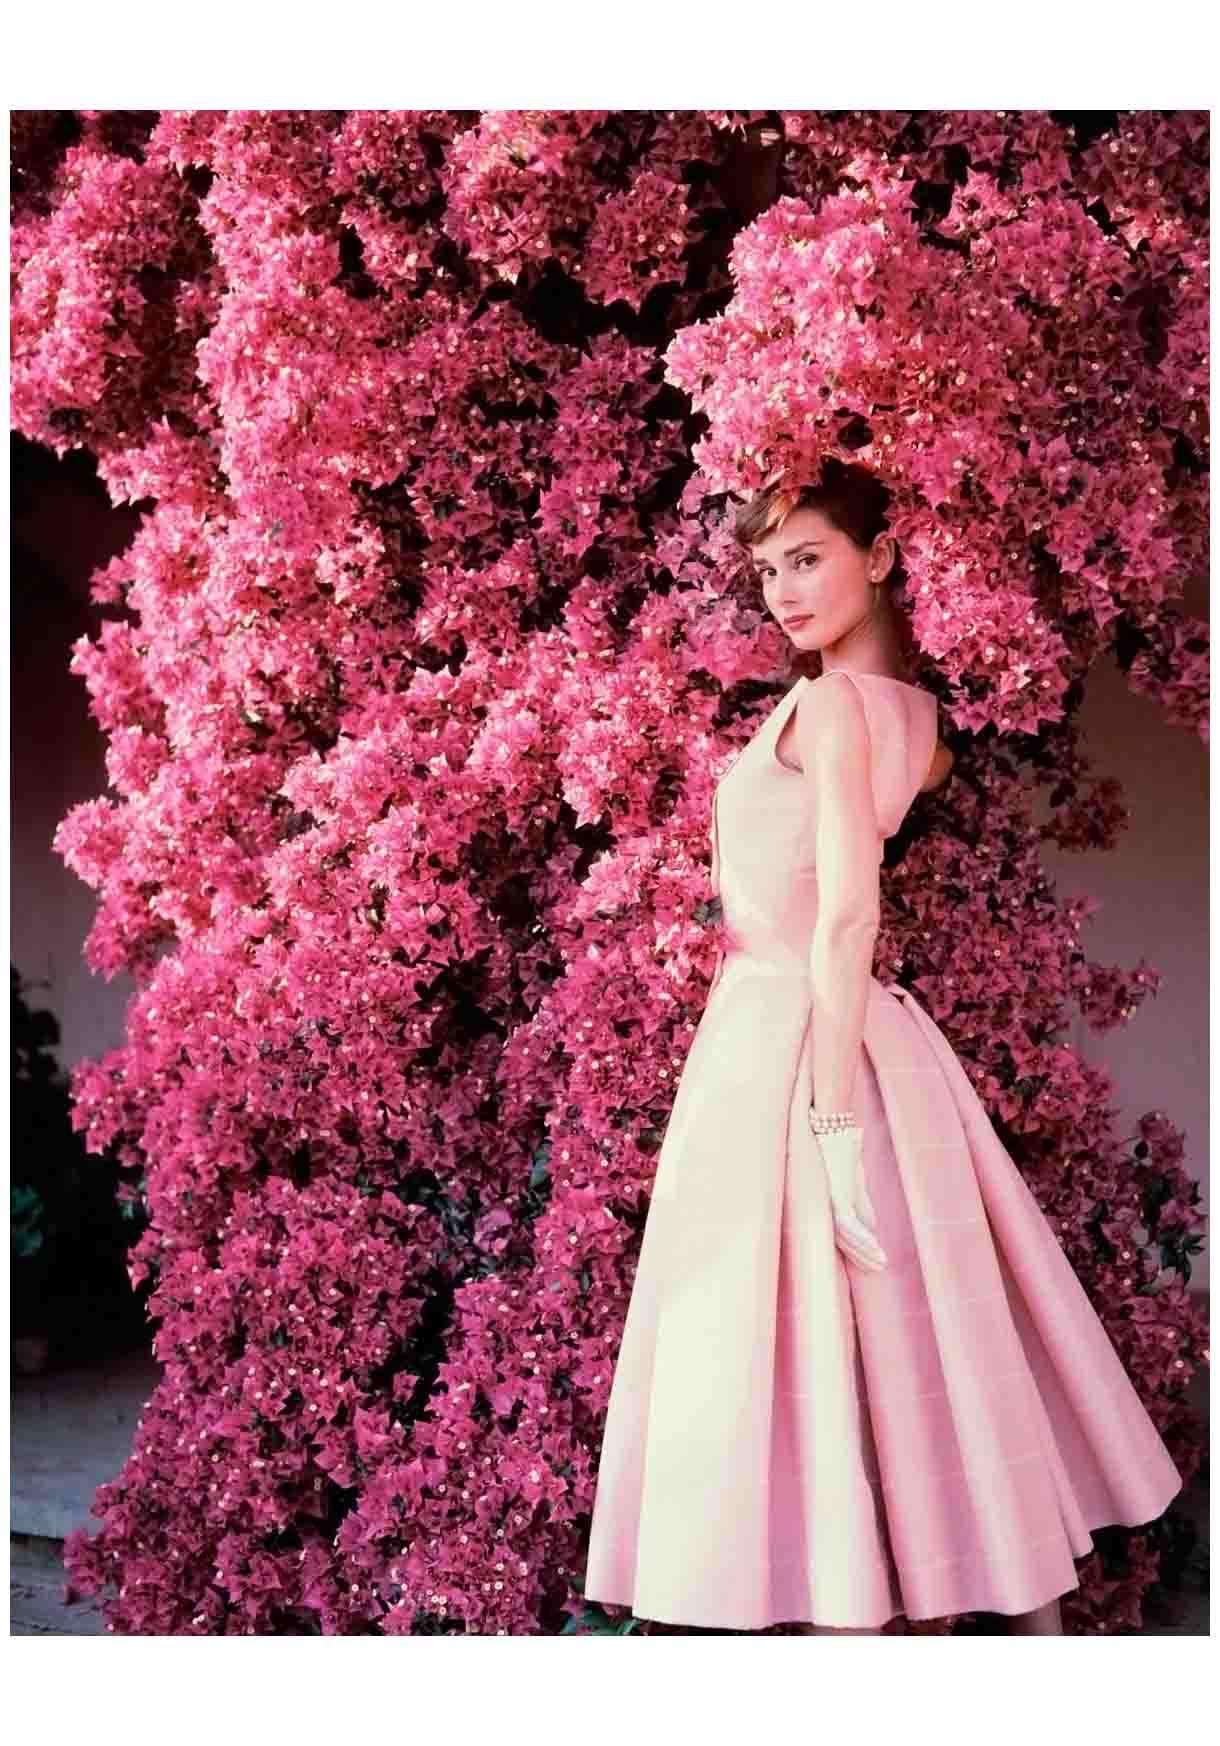 Audrey Hepburn Pleasurephoto Pagina 4